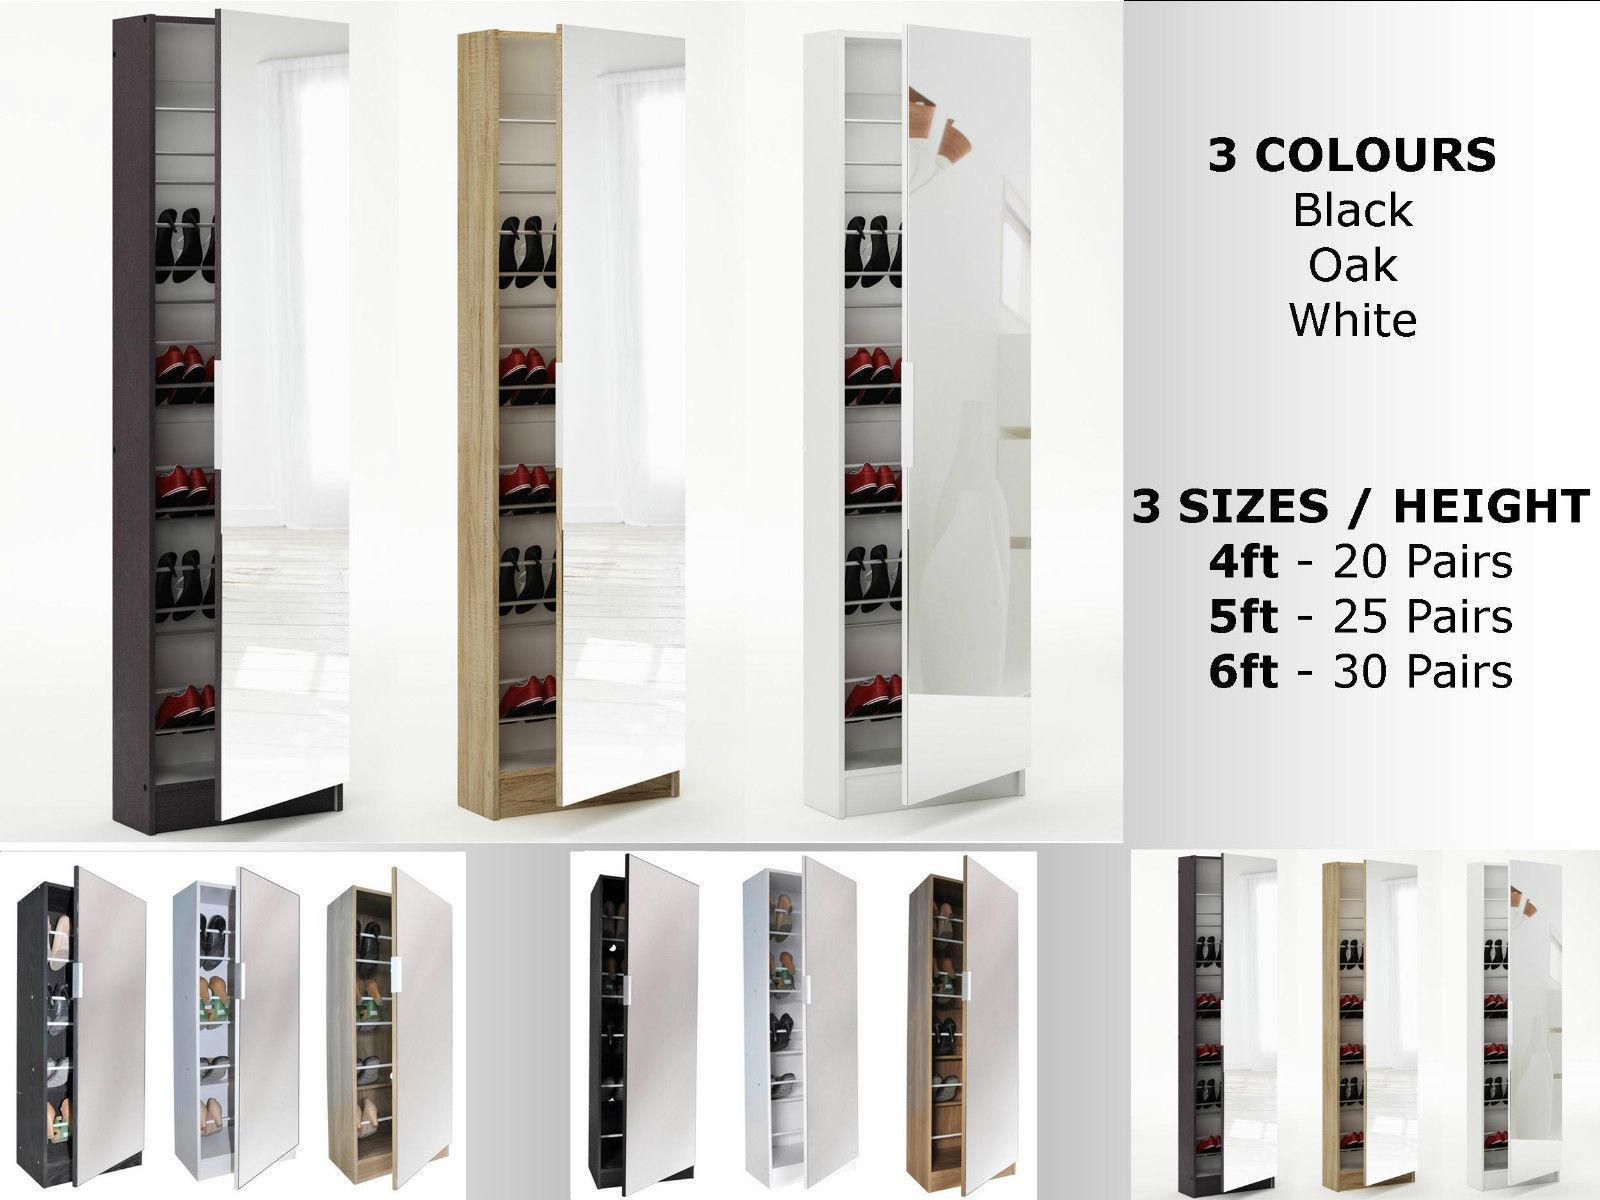 Mirrored Shoe Cabinet Storage Rack   Full Mirror   3 Sizes   Black White Oak Part 56